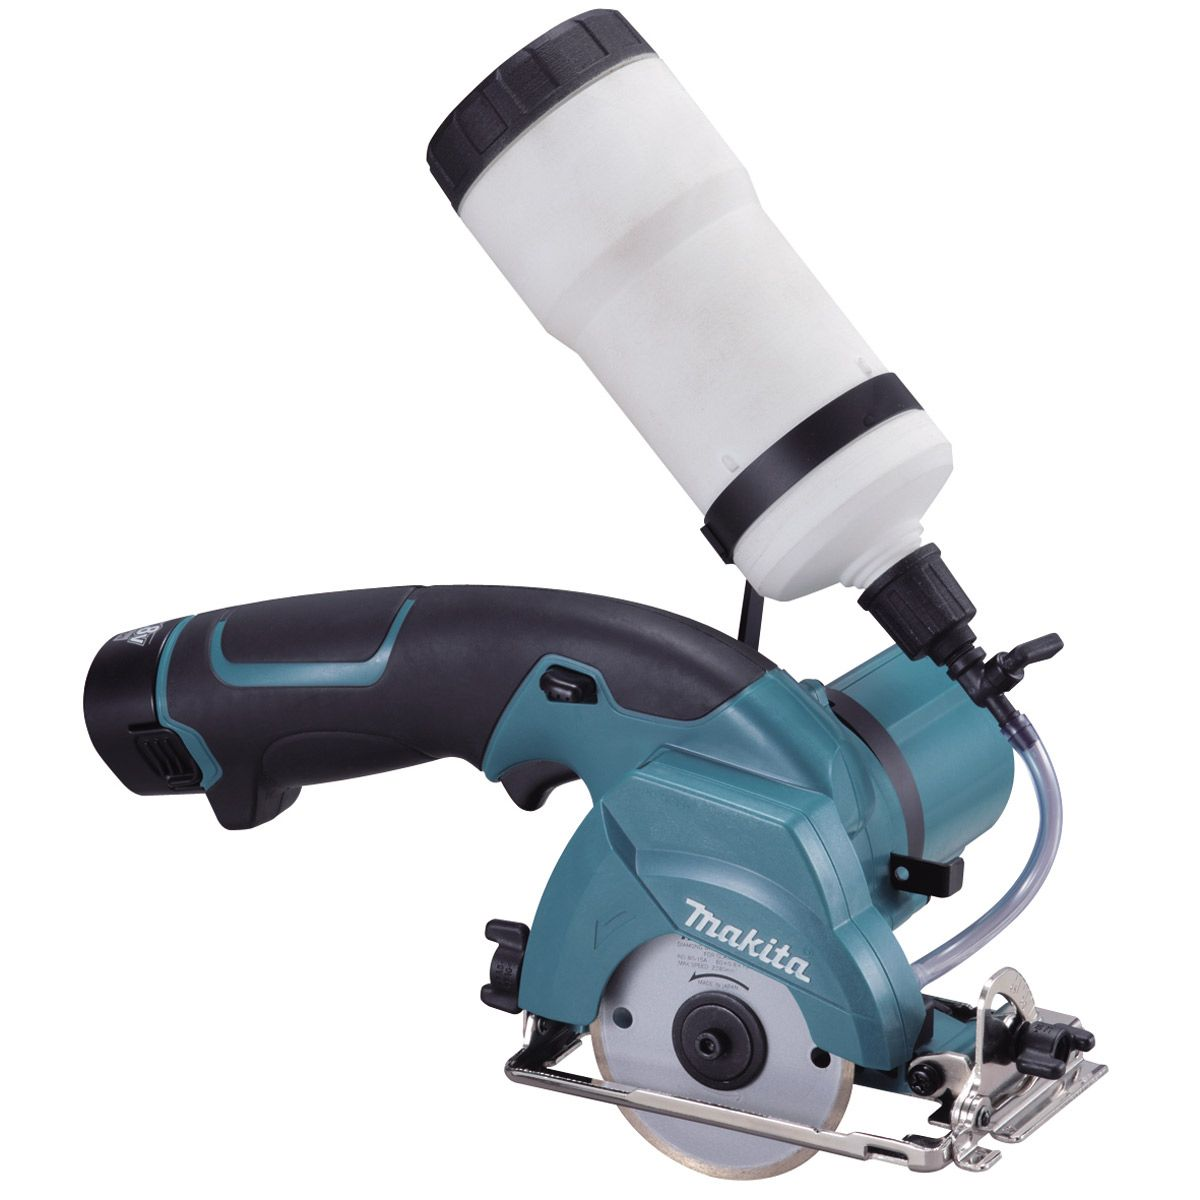 Makita Cc300dwe 10 8v Li Ion Cordless Tile Saw Glass Cutter For More Details Visit Www Toolswalt Com Makita Makita Tools Cordless Power Tools